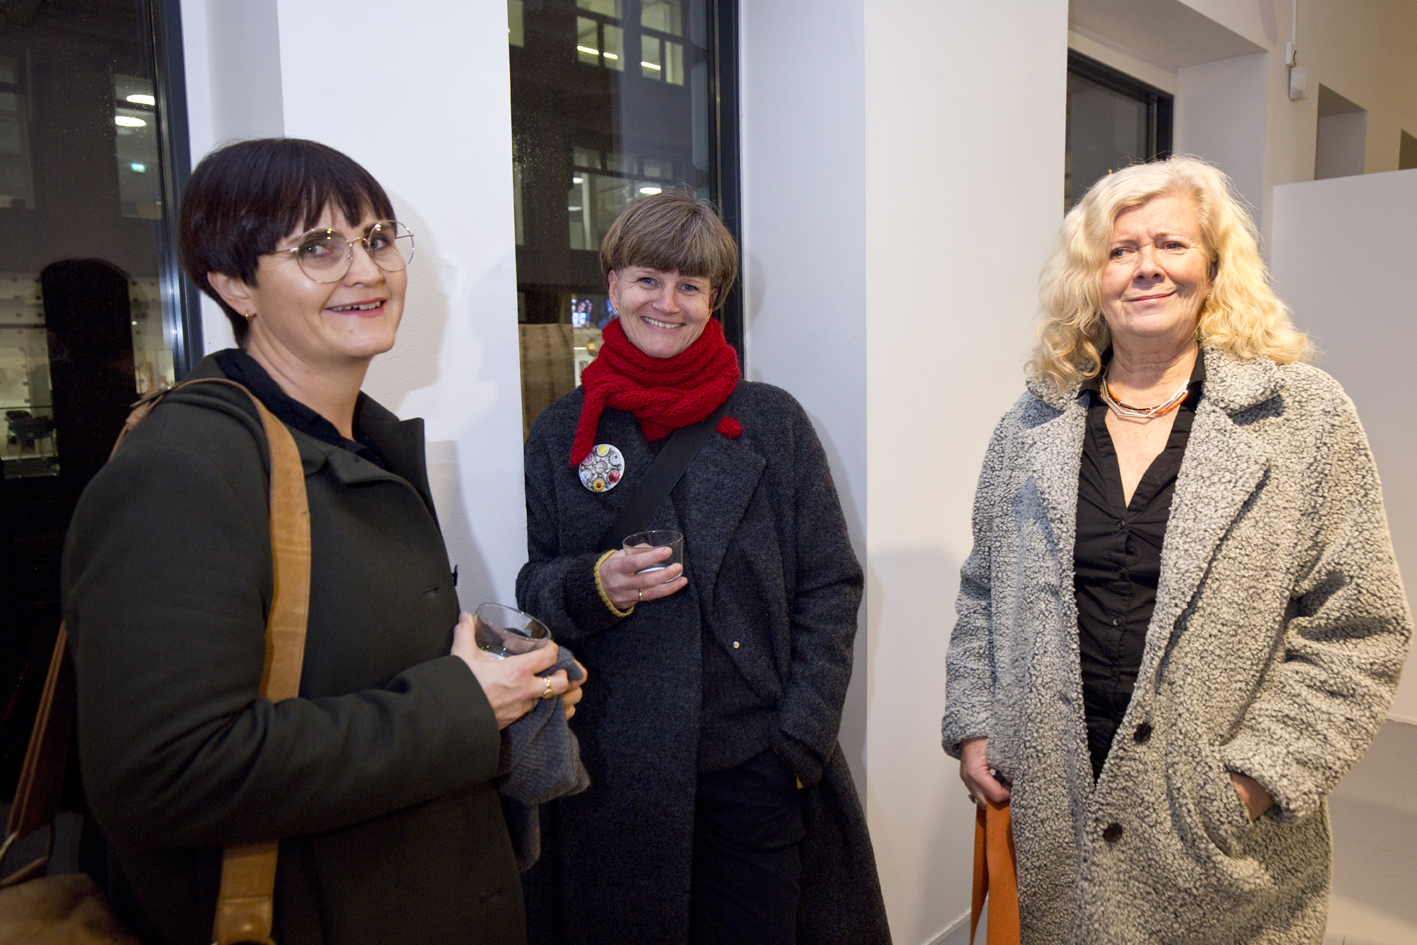 Guest designers Gry Marie Grindbakken and Berit Kowalski